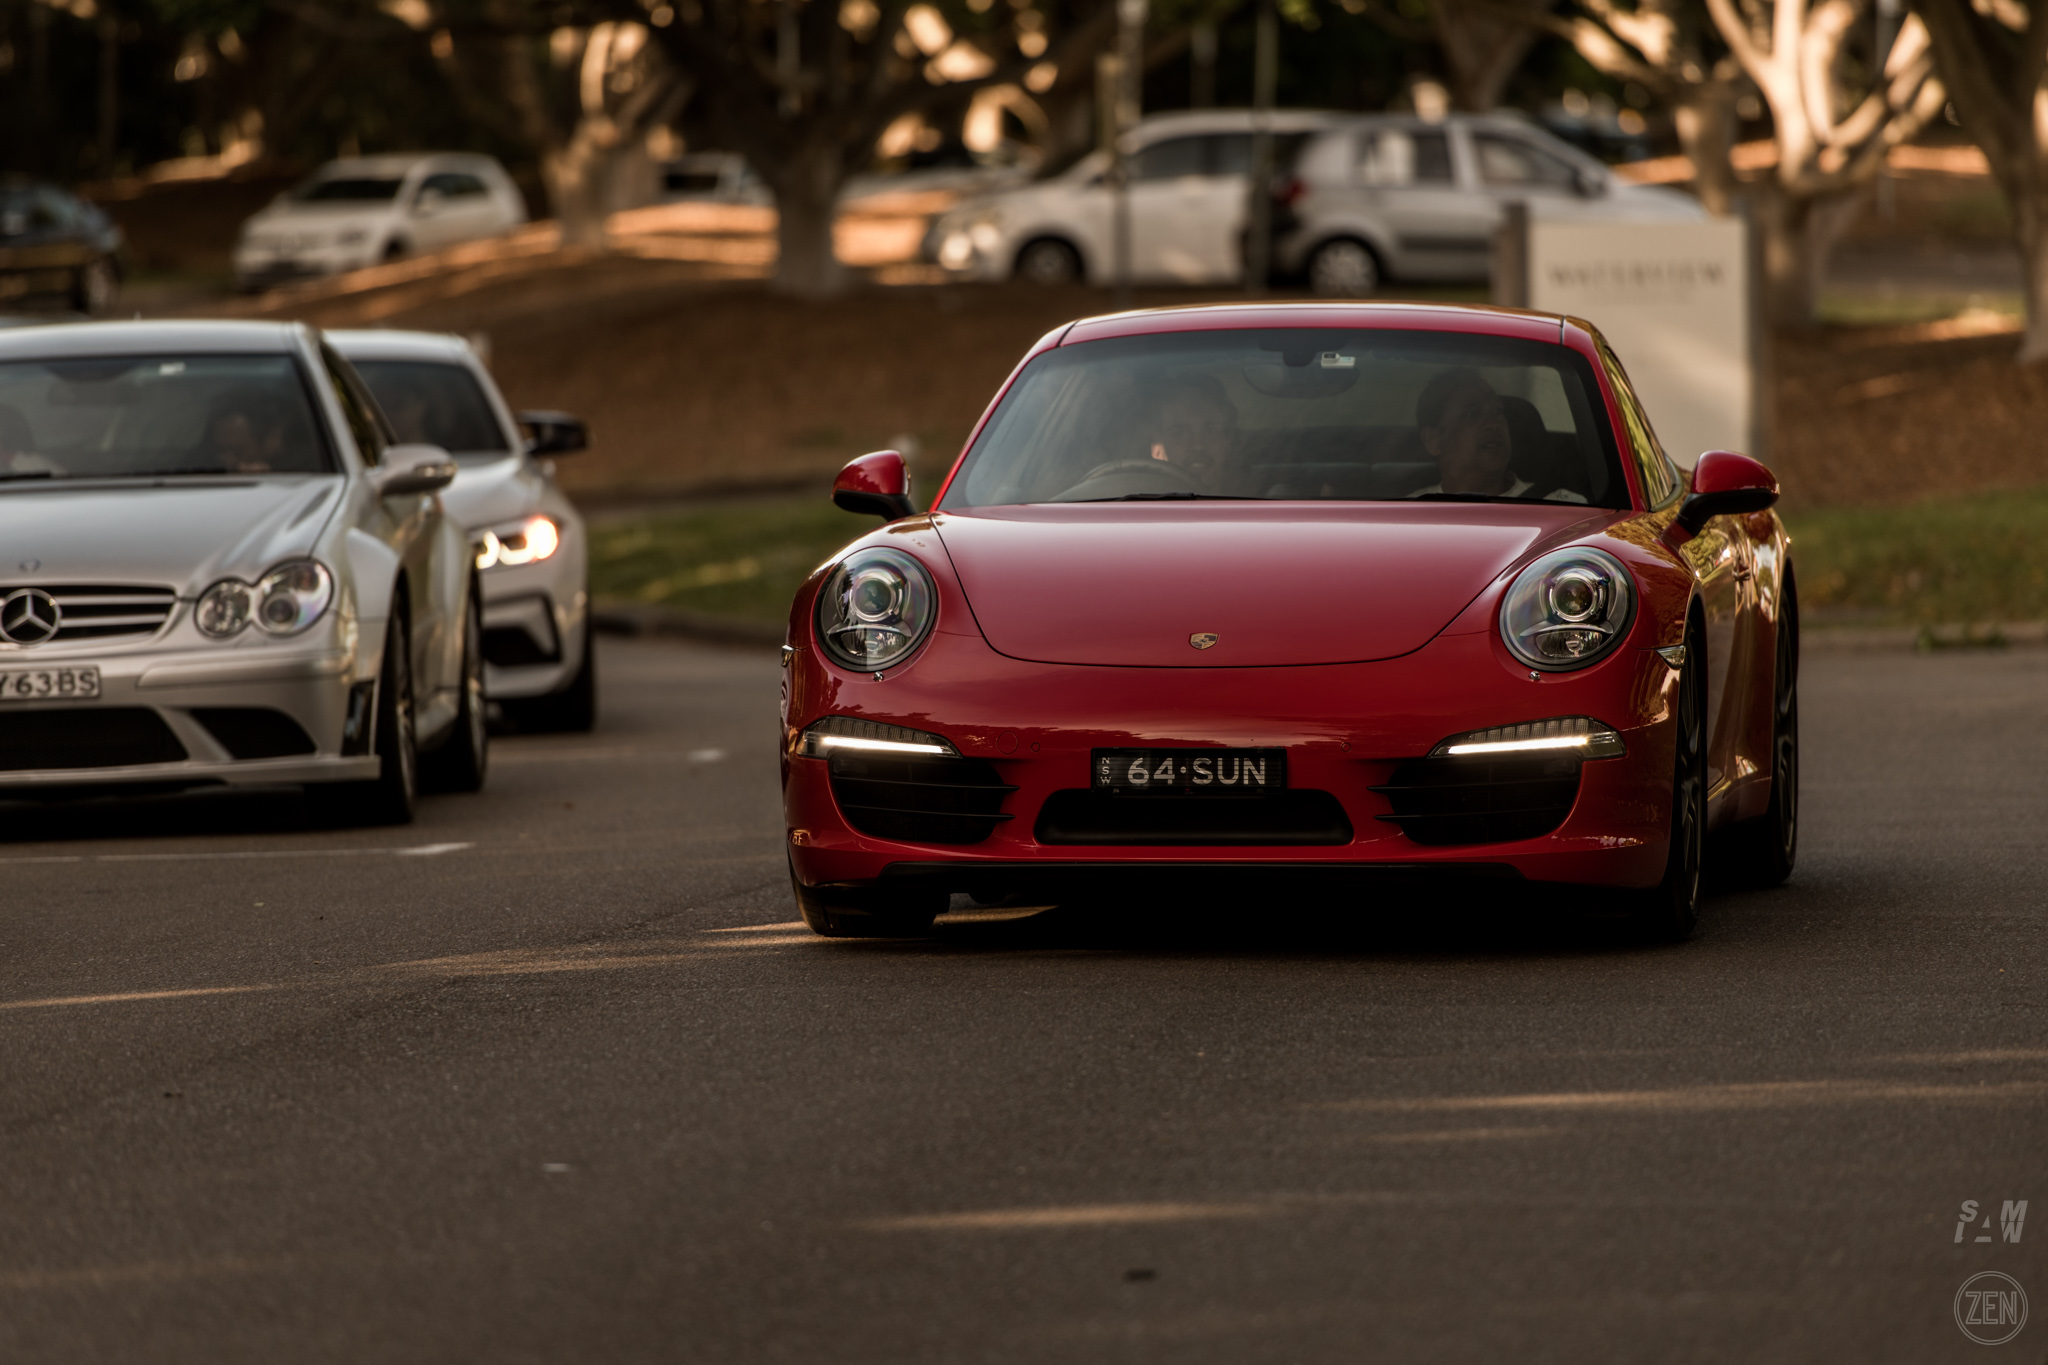 2019-10-27 - Autohaus Porsches & Coffee 103